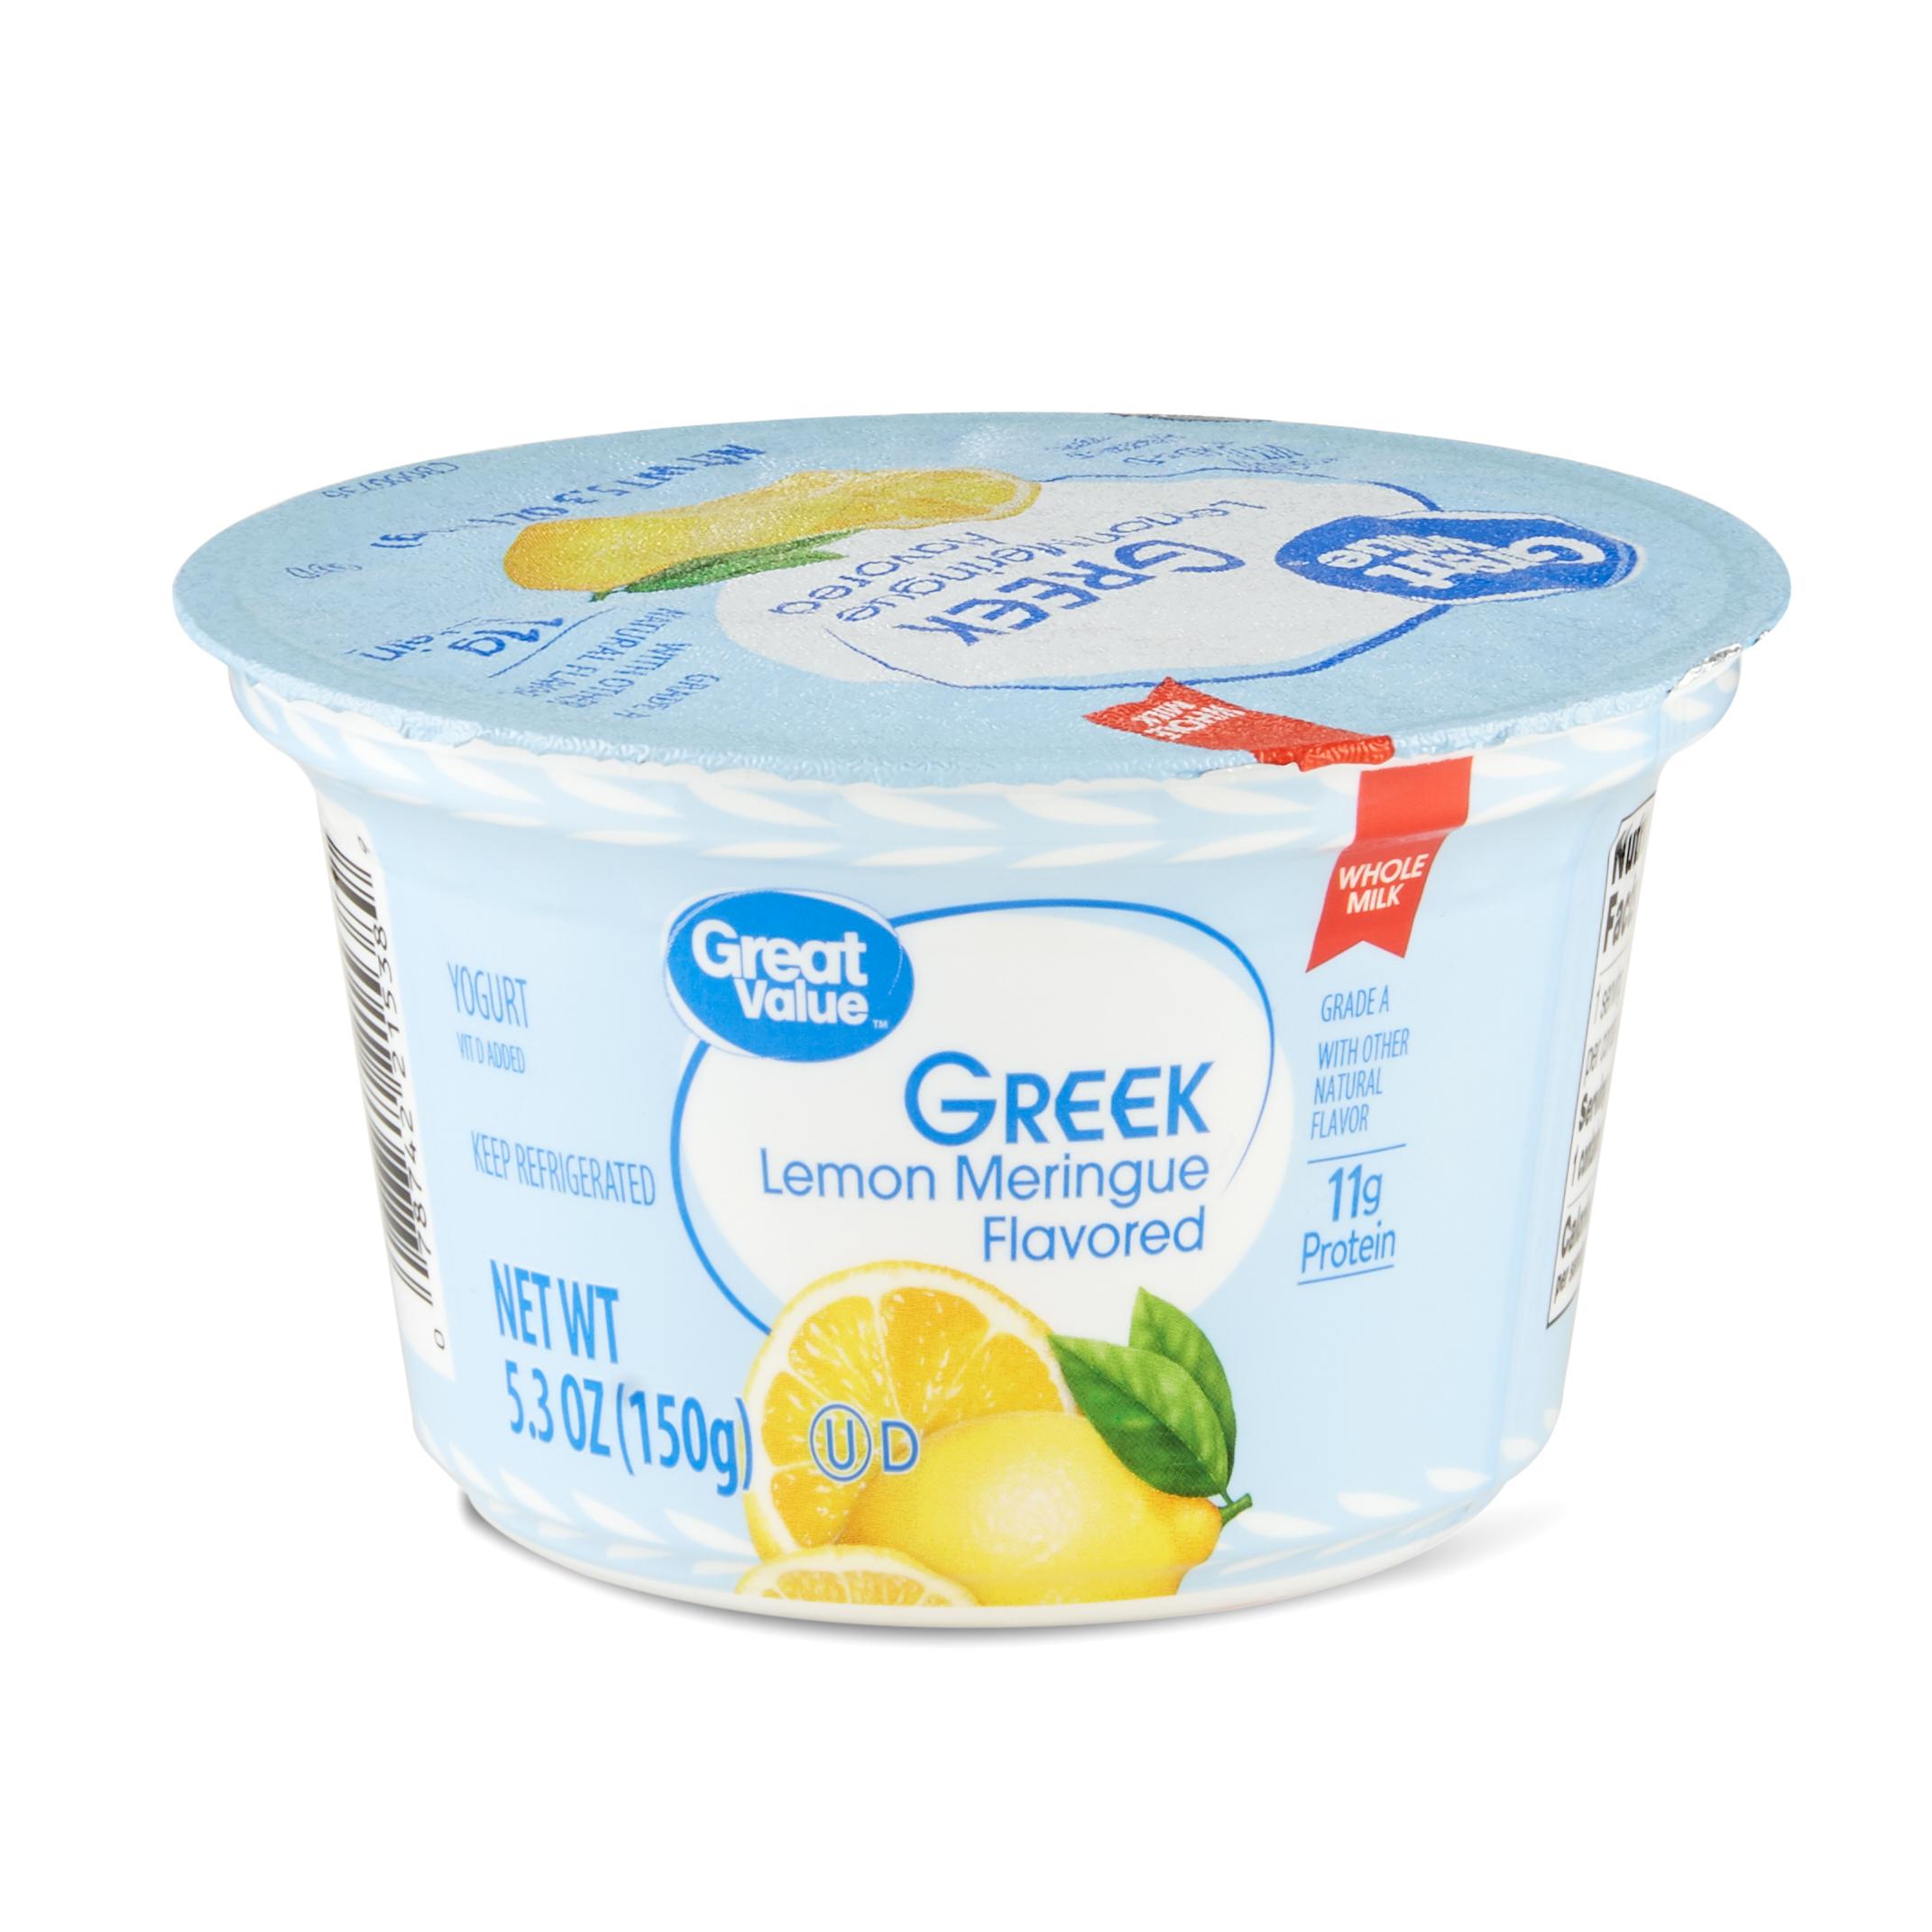 Great Value Lemon Meringue Greek Yogurt, 5.3 oz